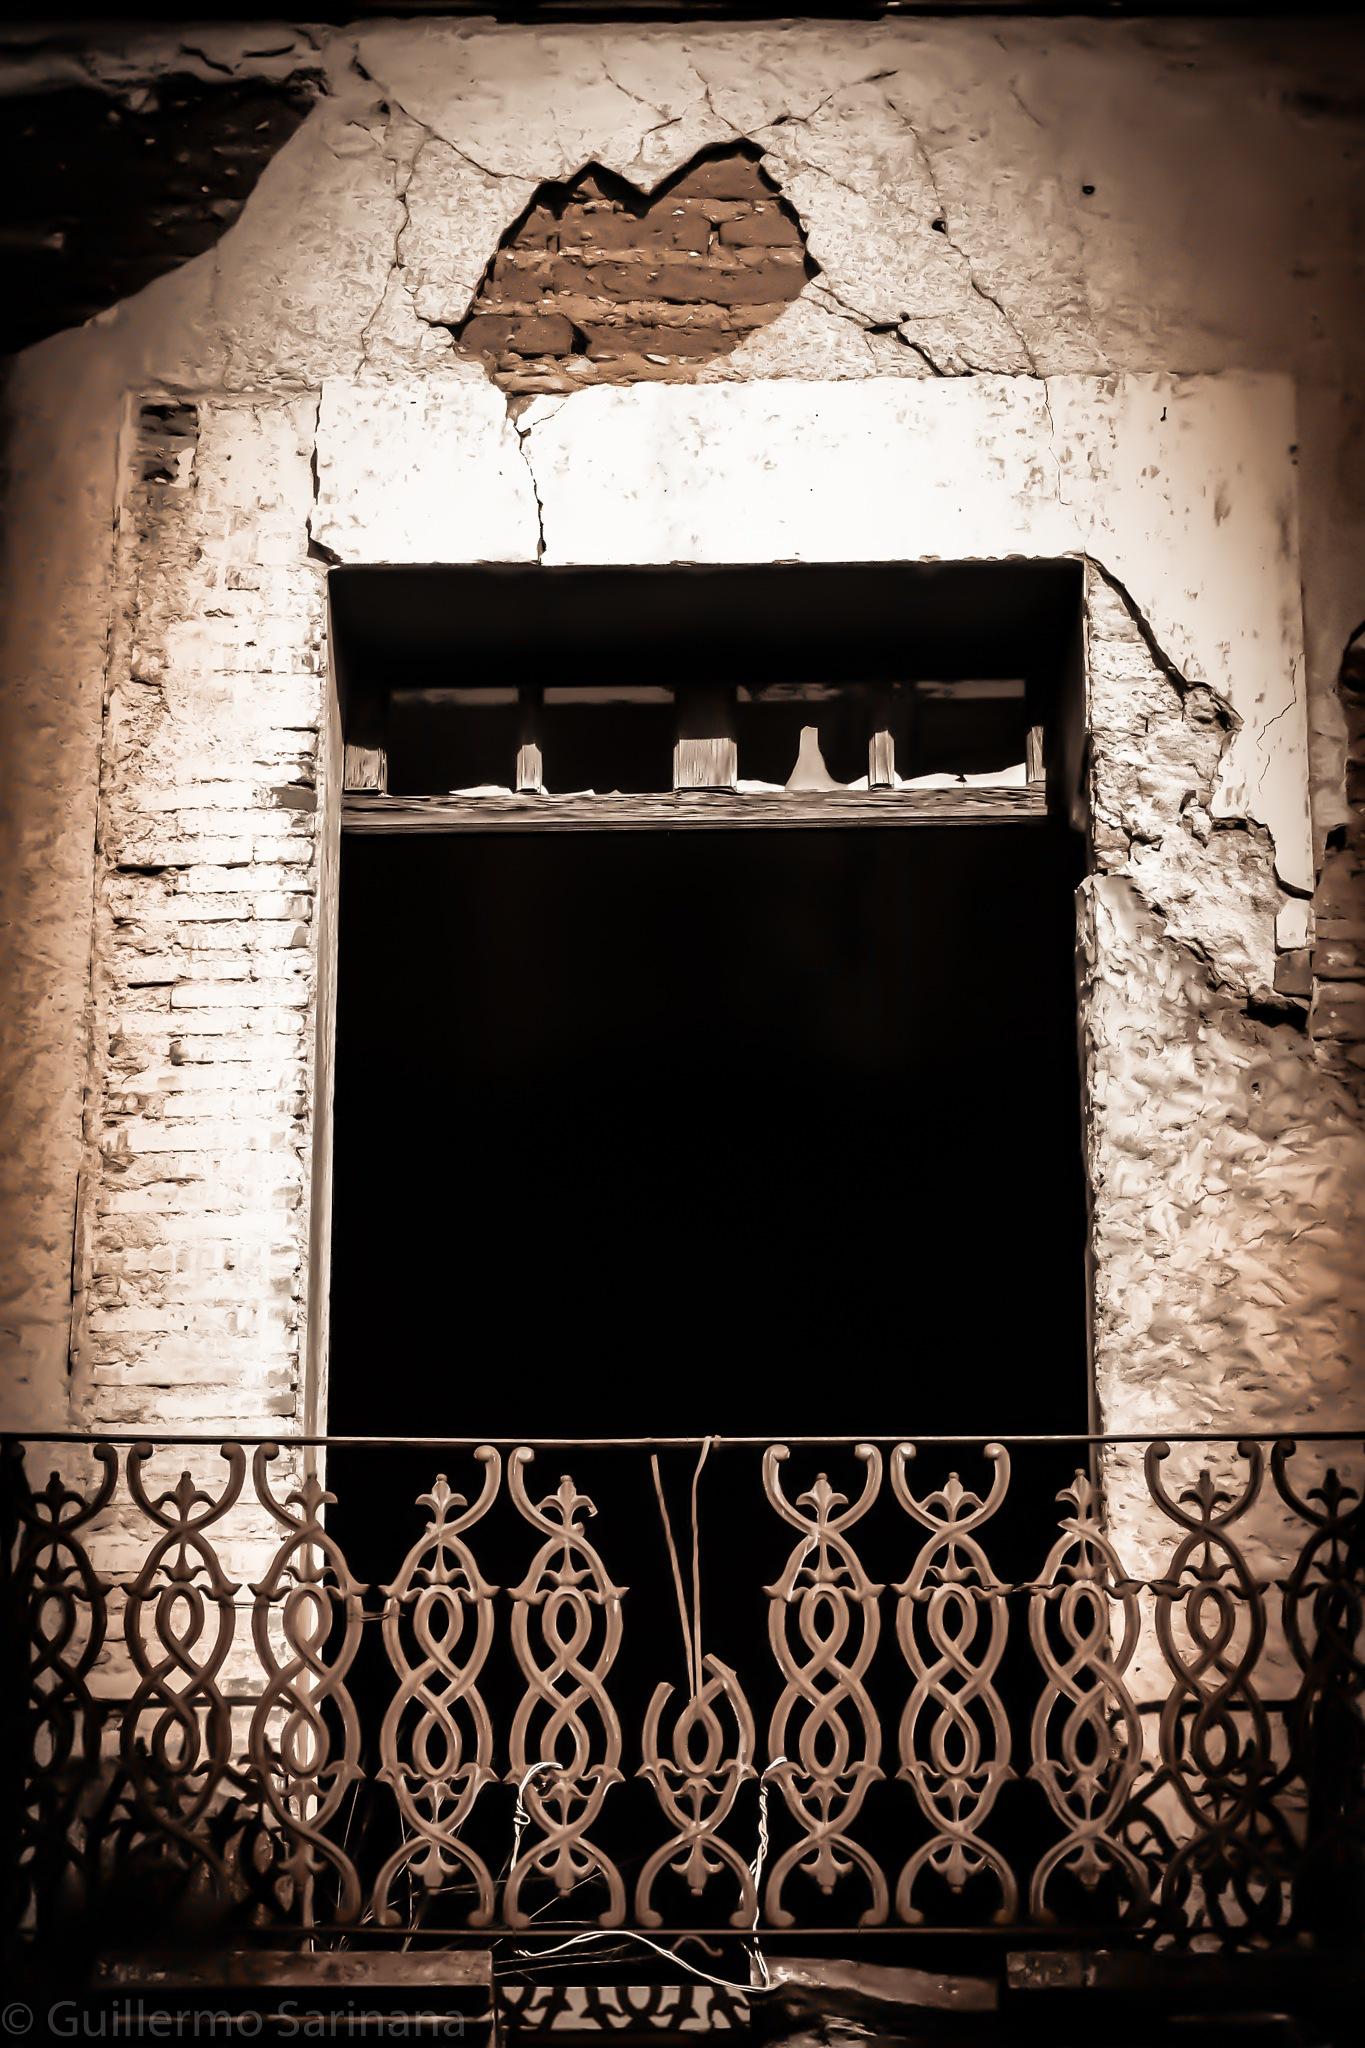 Window by Guillermo Sariñana Siller